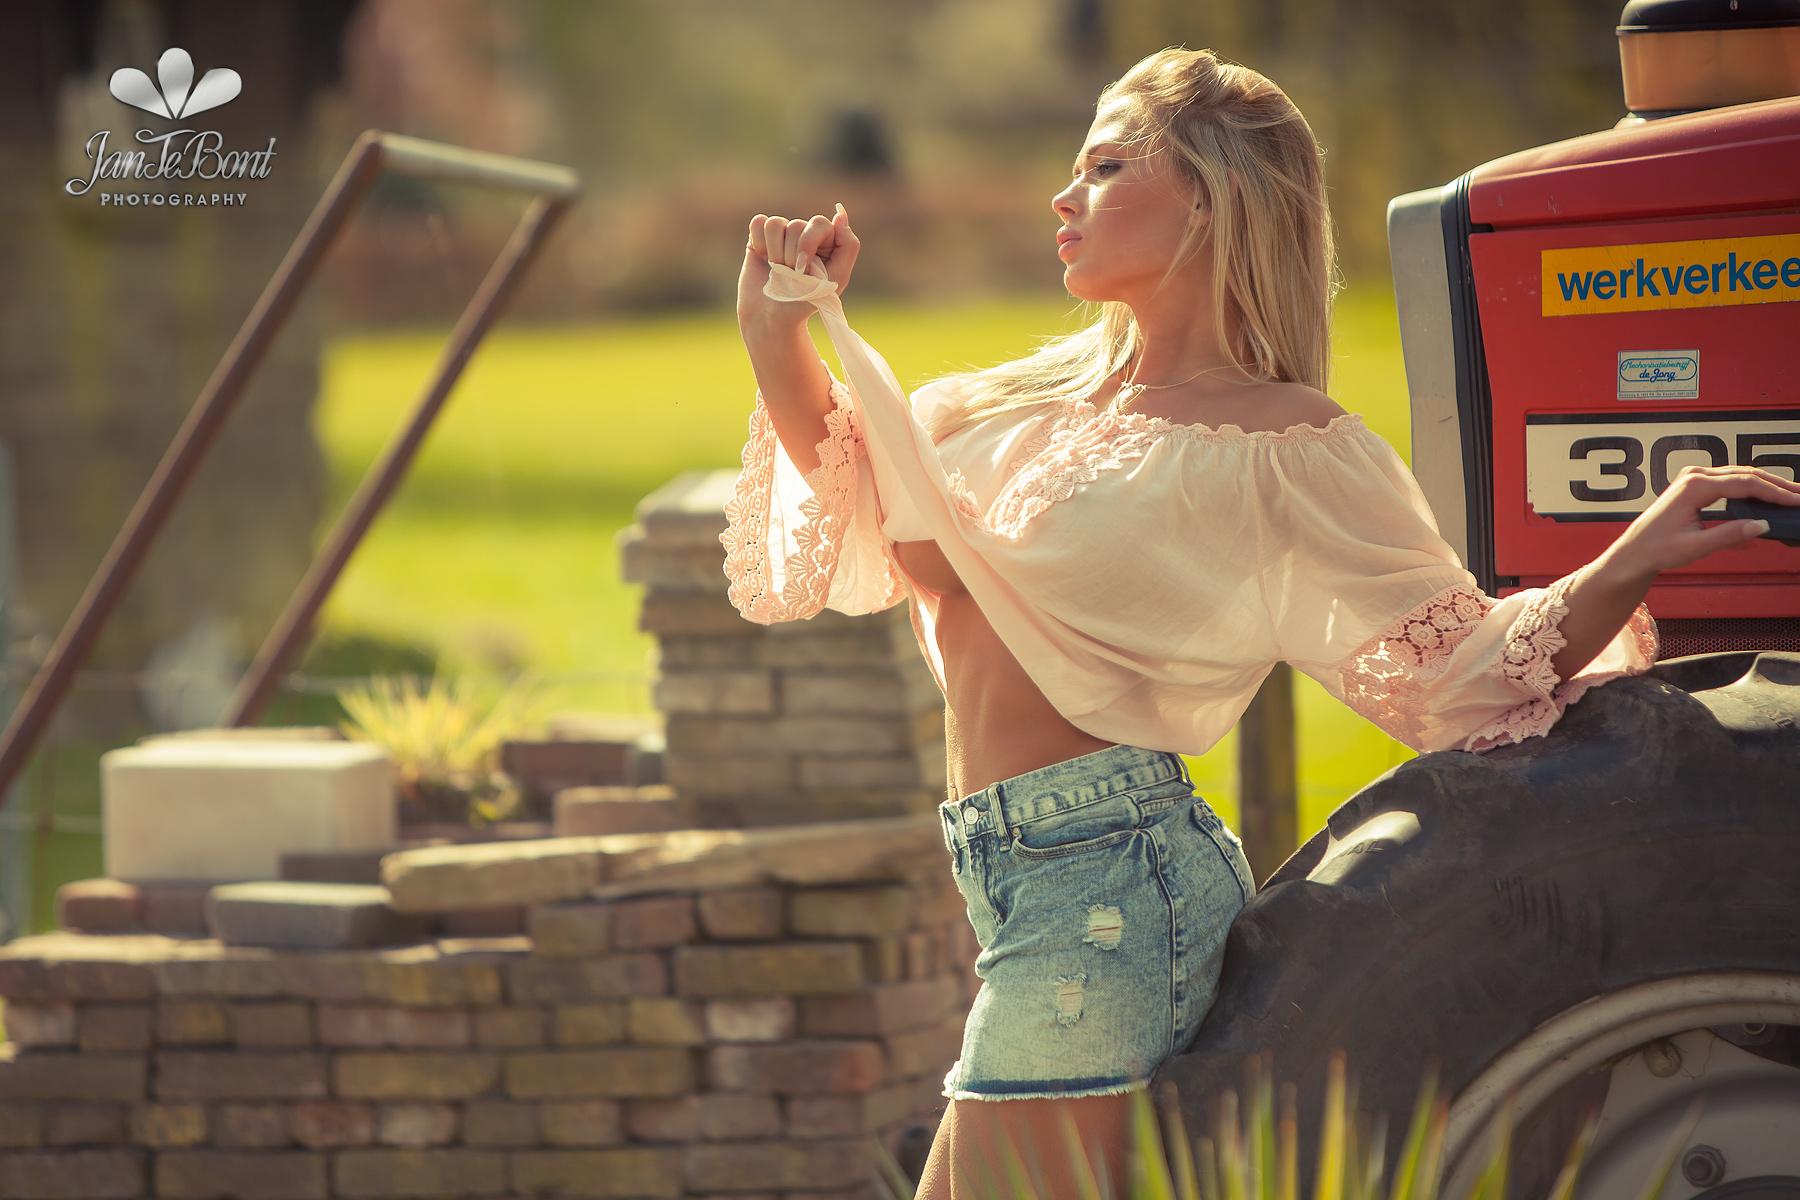 Fabienna Valentina blonde barbie lips longhair model glamour busty big boobs beauty sexy perfect girl lady woman jan te bont jantebont JTB doutze kroese sea bikini beach bikinimodel bikinibabe rimlight sunset sundawn soft romantic bokeh depth of field blue eyes massive farmergirl boudoir lingerie pignoir